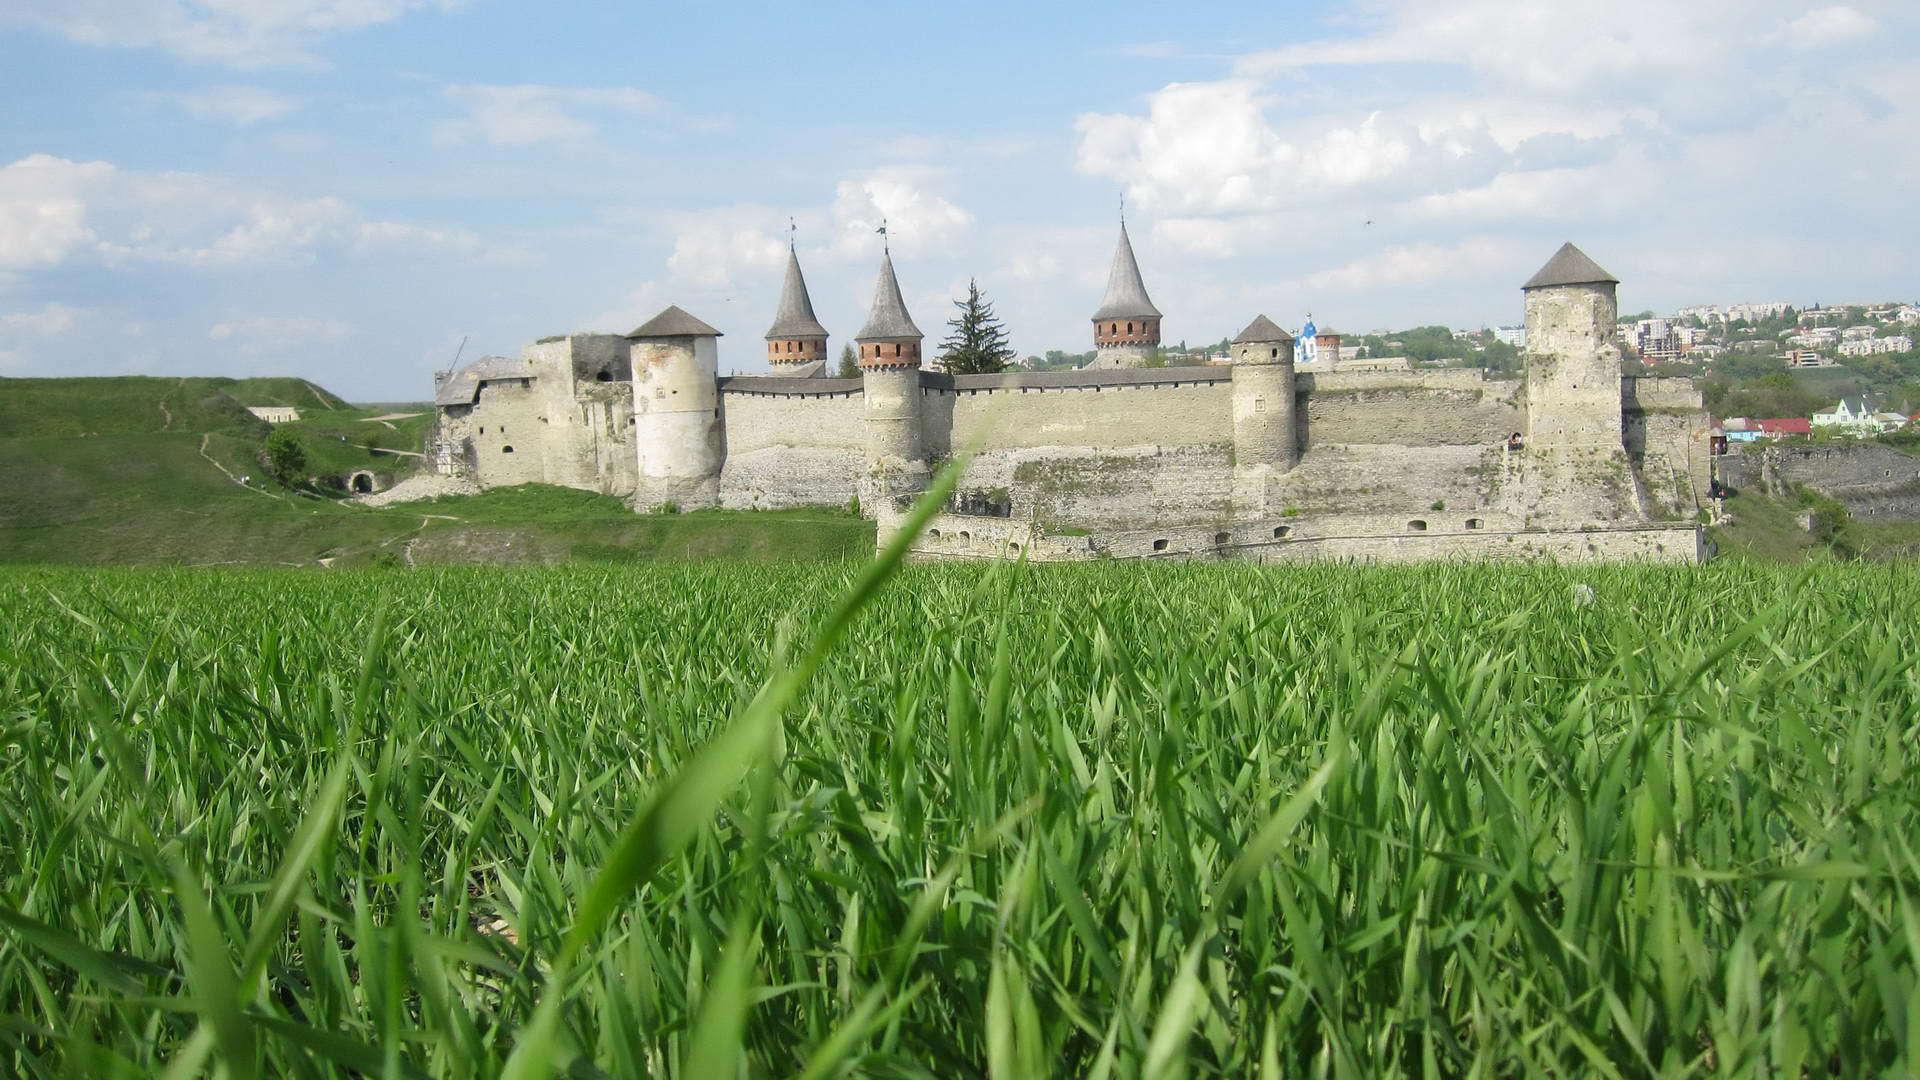 Фортеця в Кам'янець-Подільську